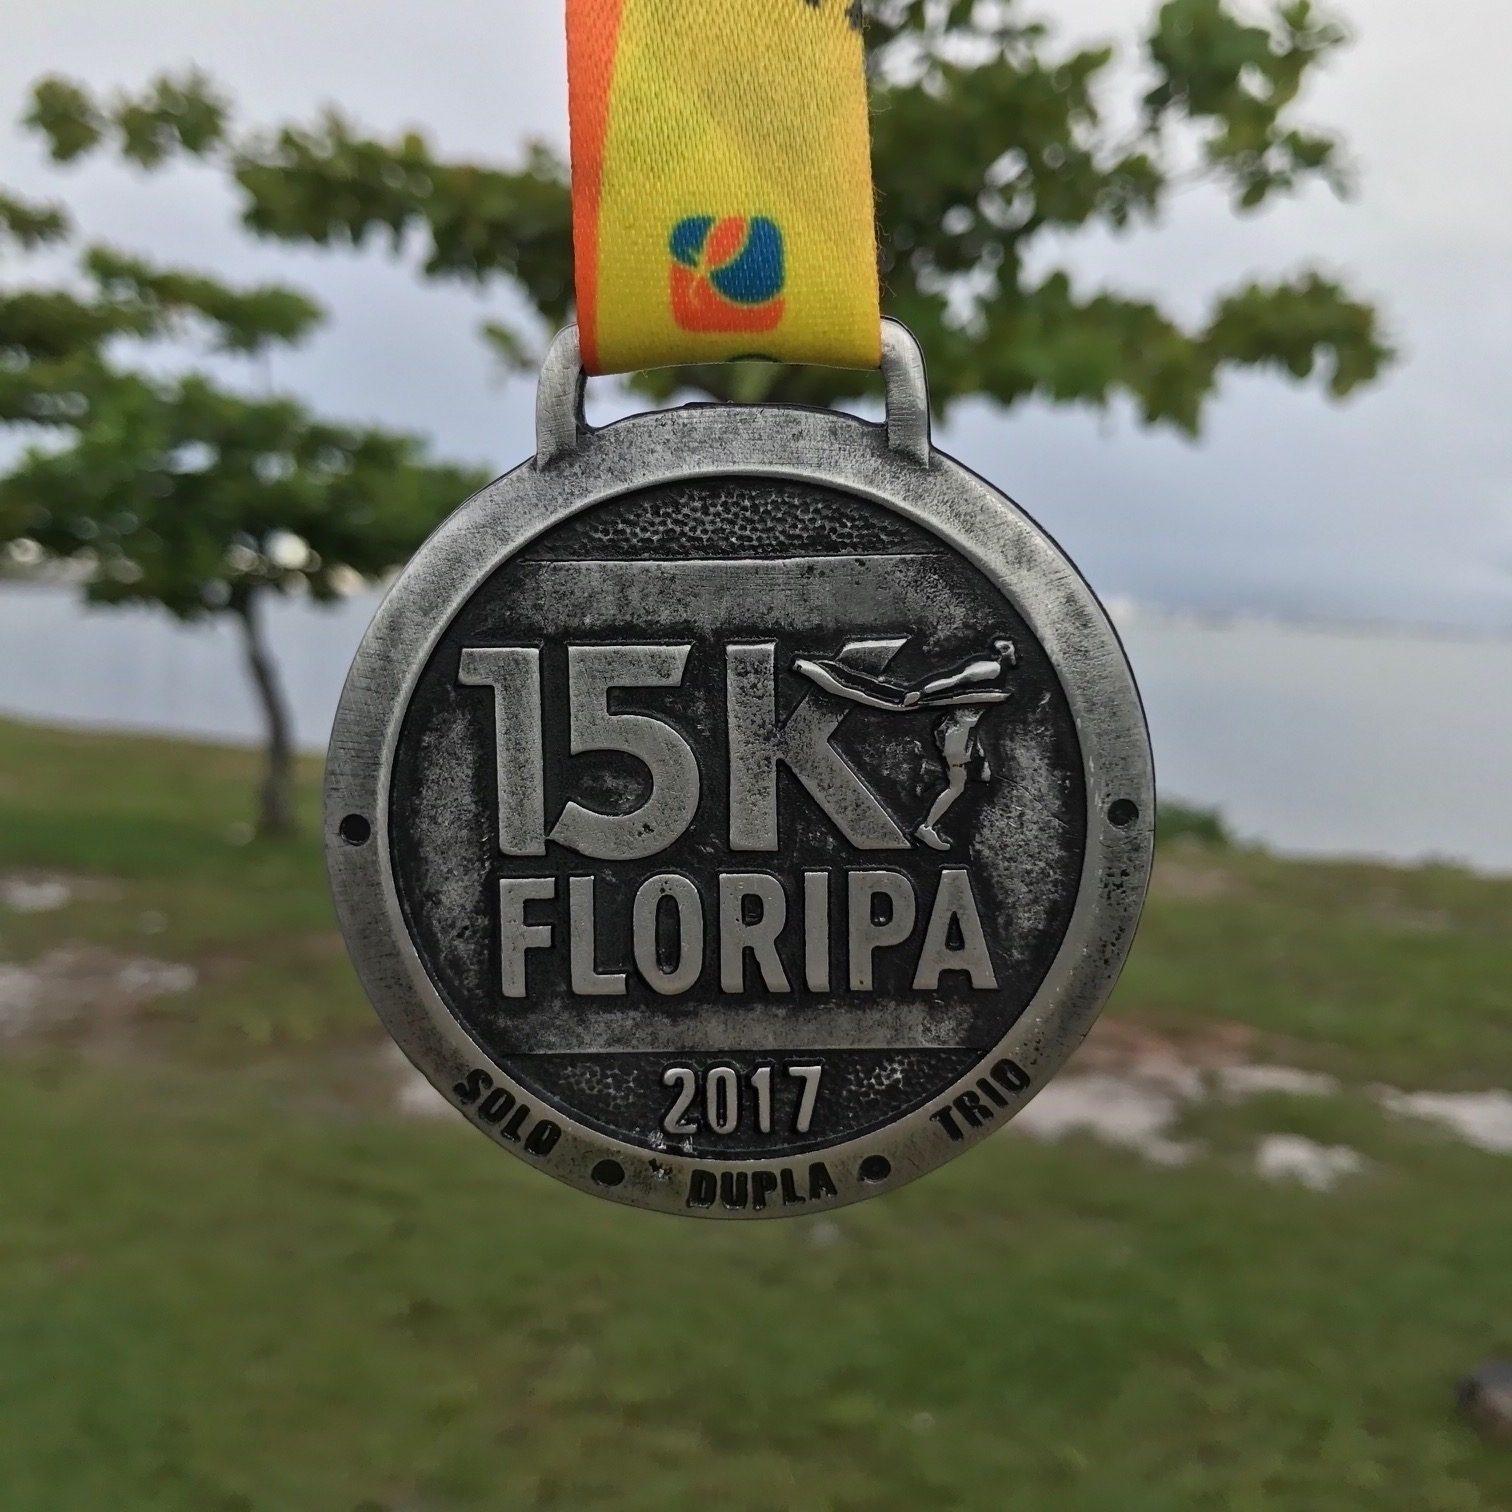 15K Floripa – 26/03/2017